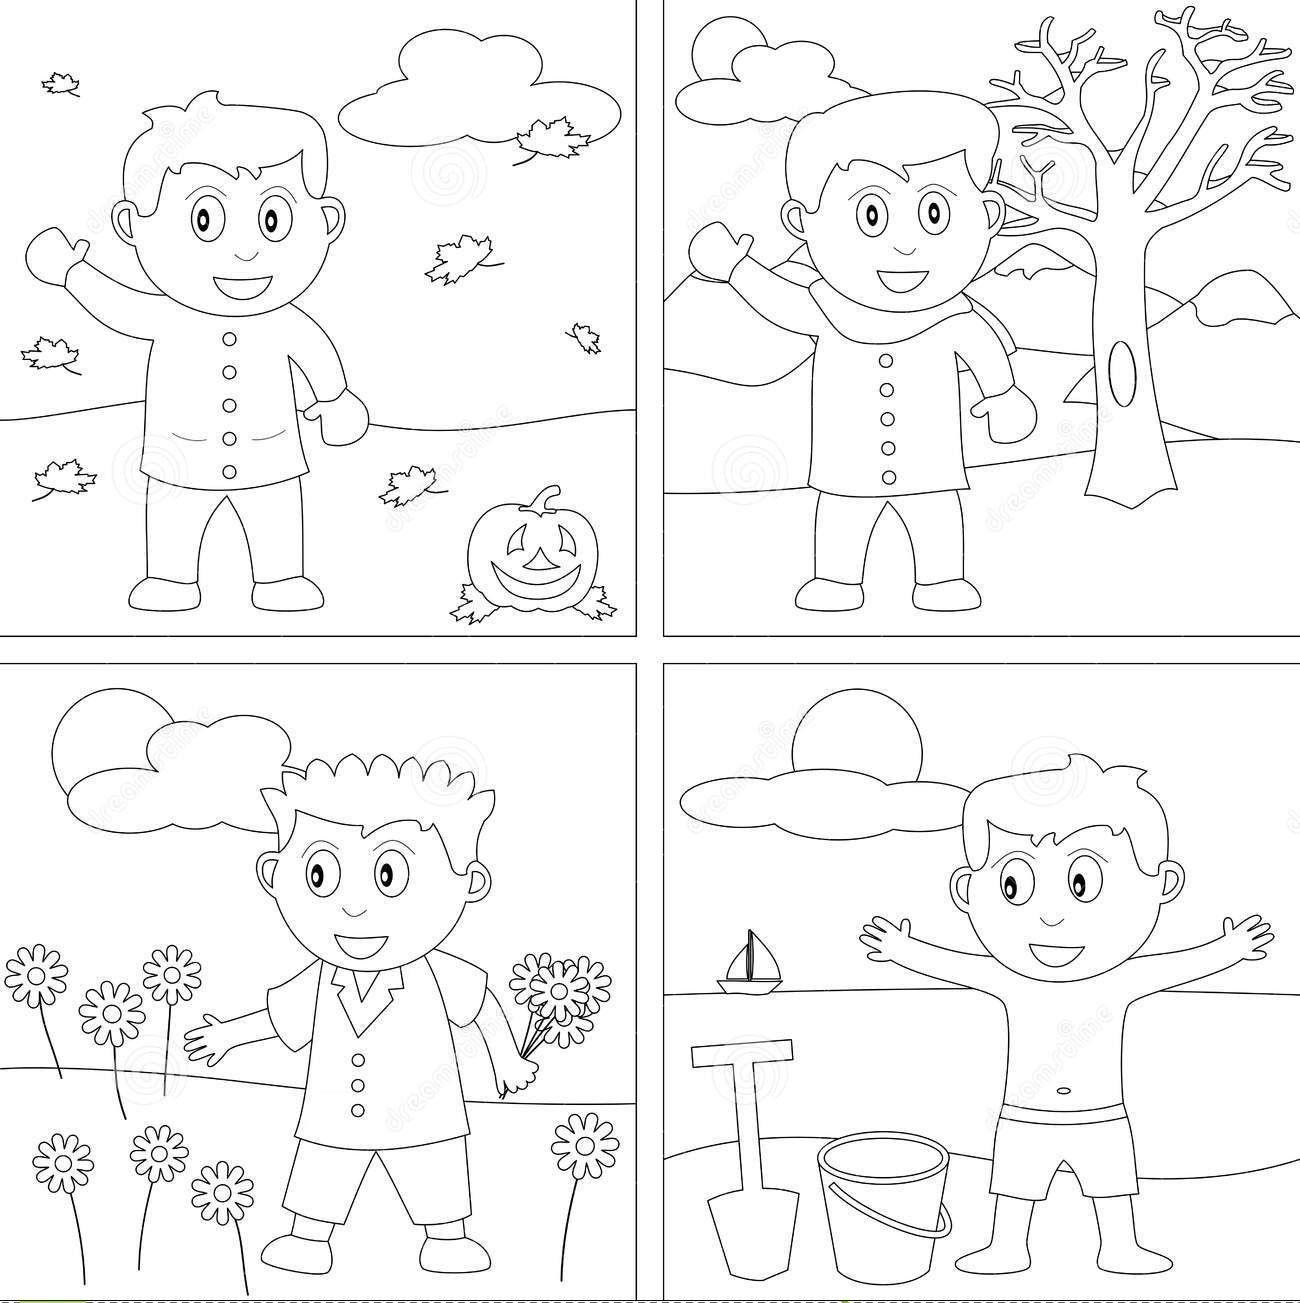 Predownload: Akramul97 I Will Draw Coloring Book Page For Children For 5 On Fiverr Com In 2021 Seasons Preschool Seasons Worksheets Seasons Kindergarten [ 1303 x 1300 Pixel ]